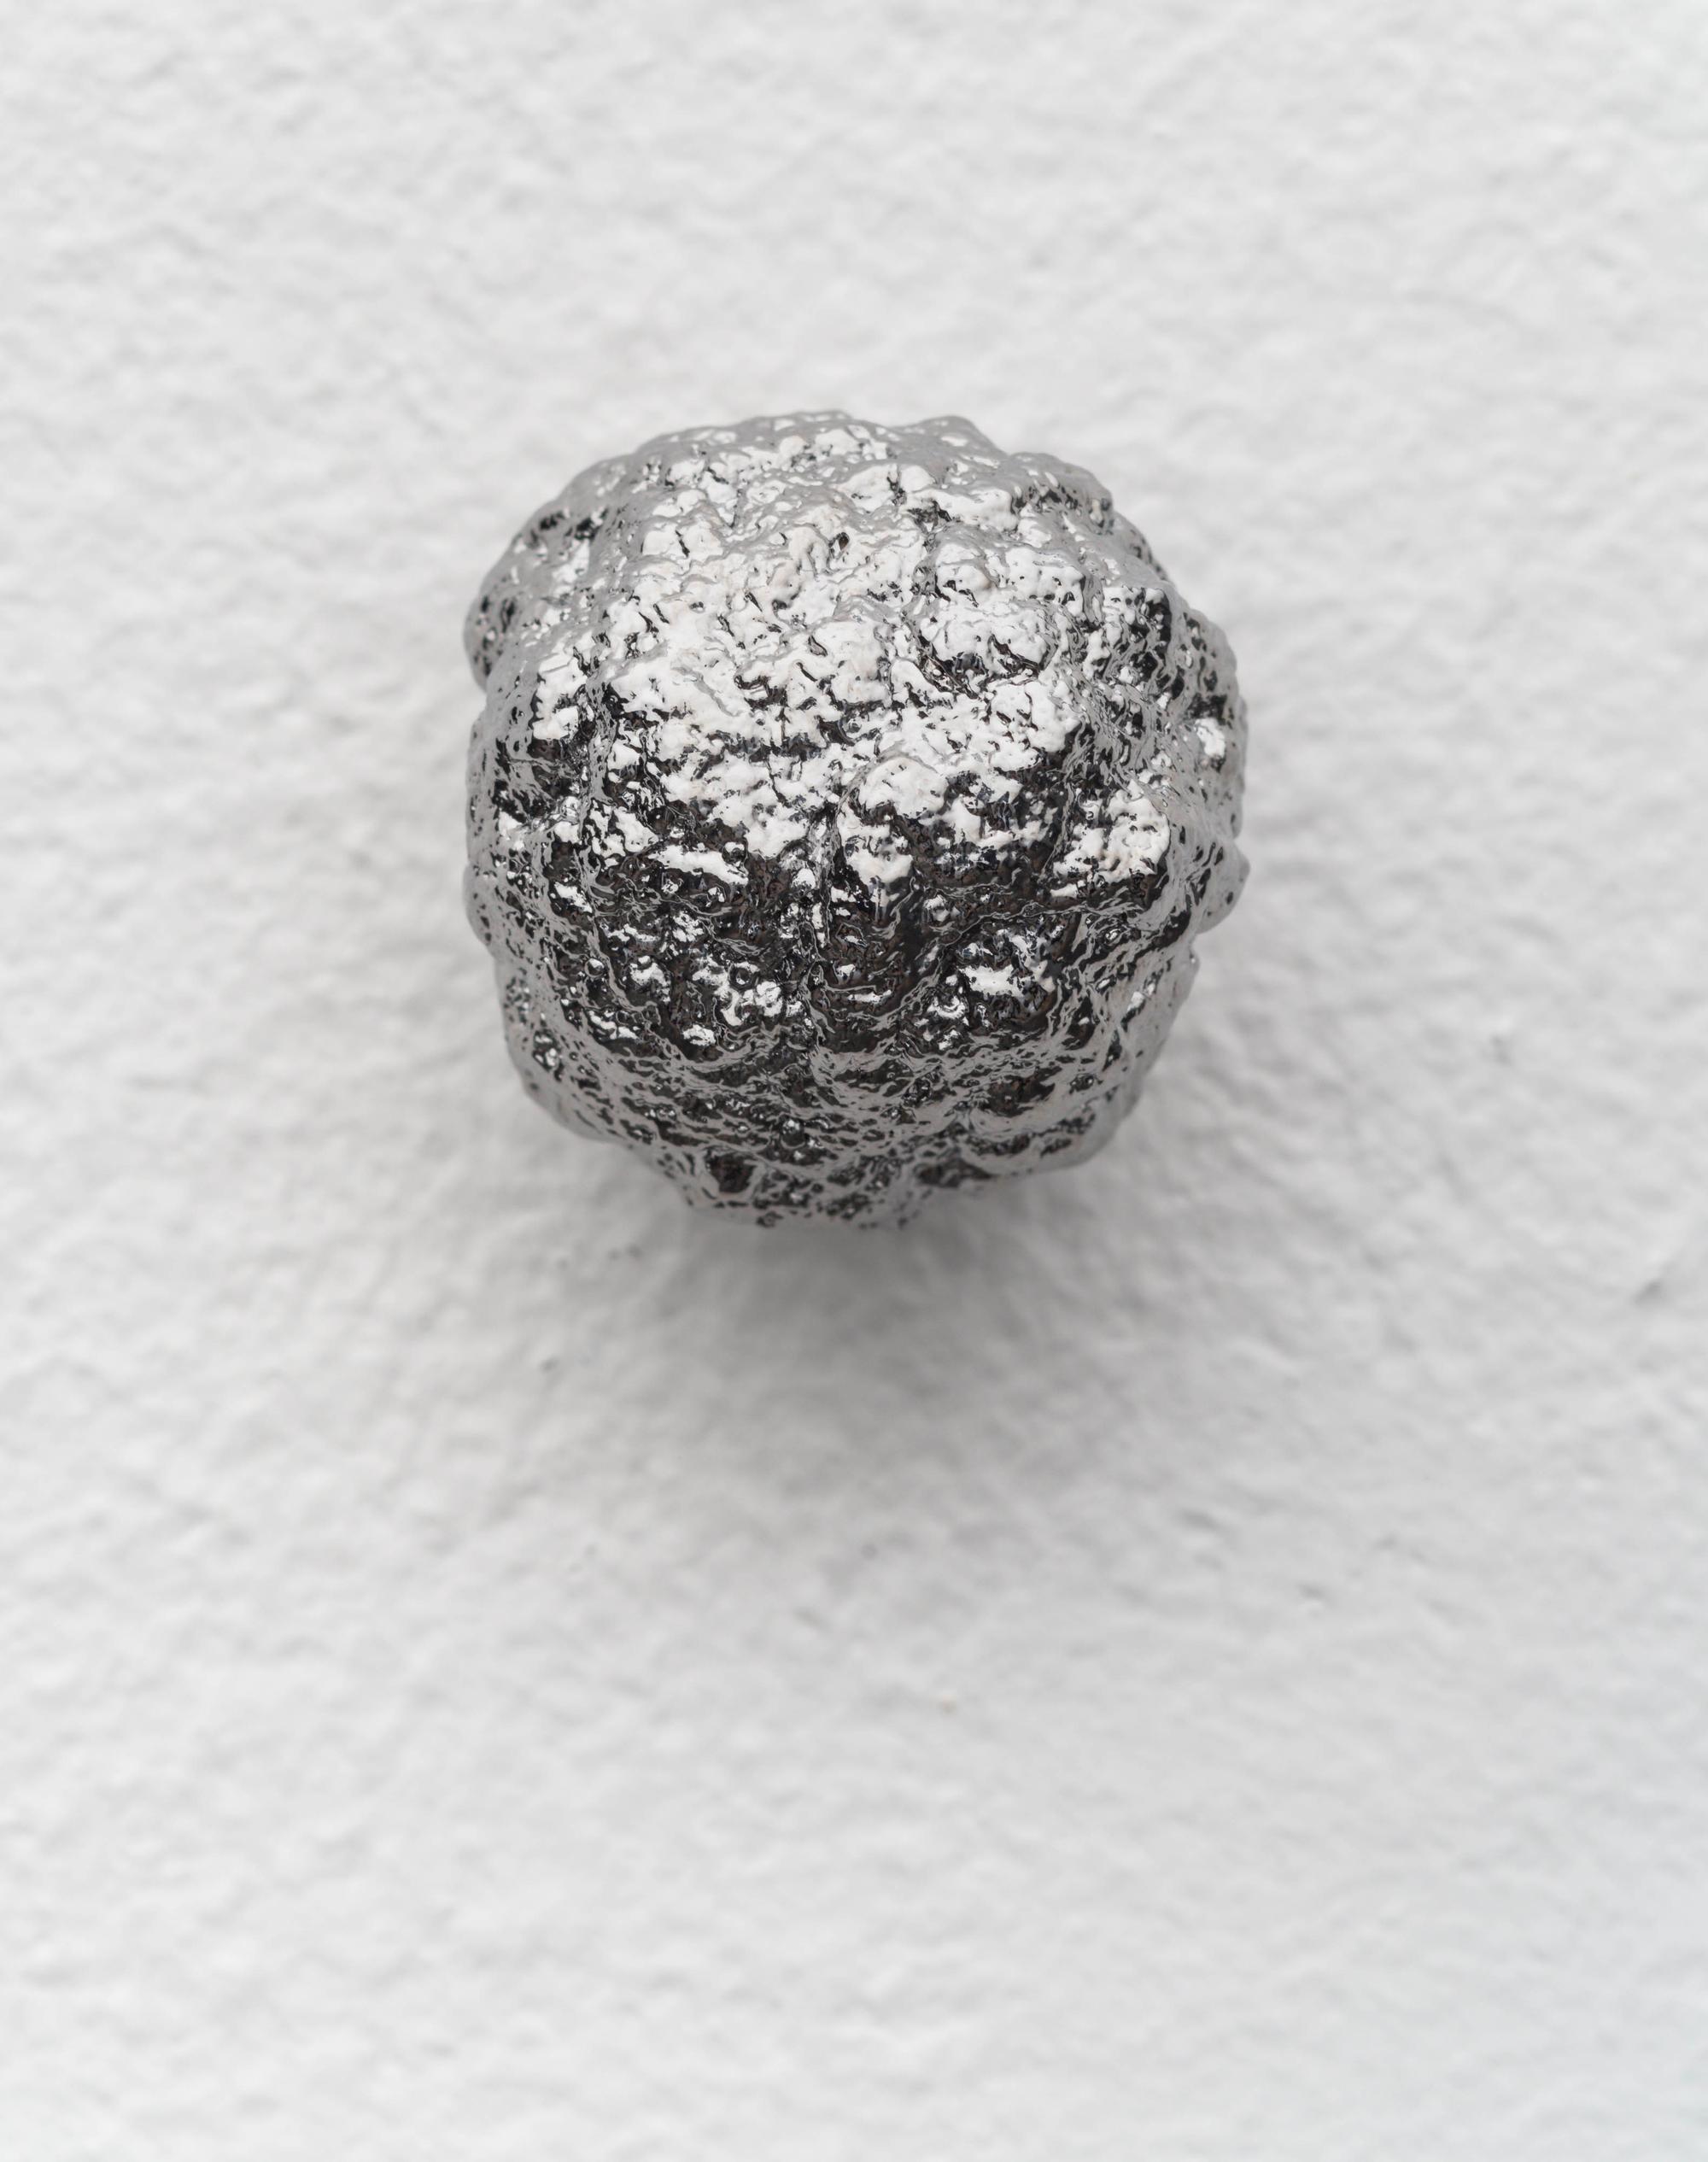 Bullet Meat Head, 2020, Chrome-plated bronze, approx. Ø 3 cm each (series of 22 unique sculptures)